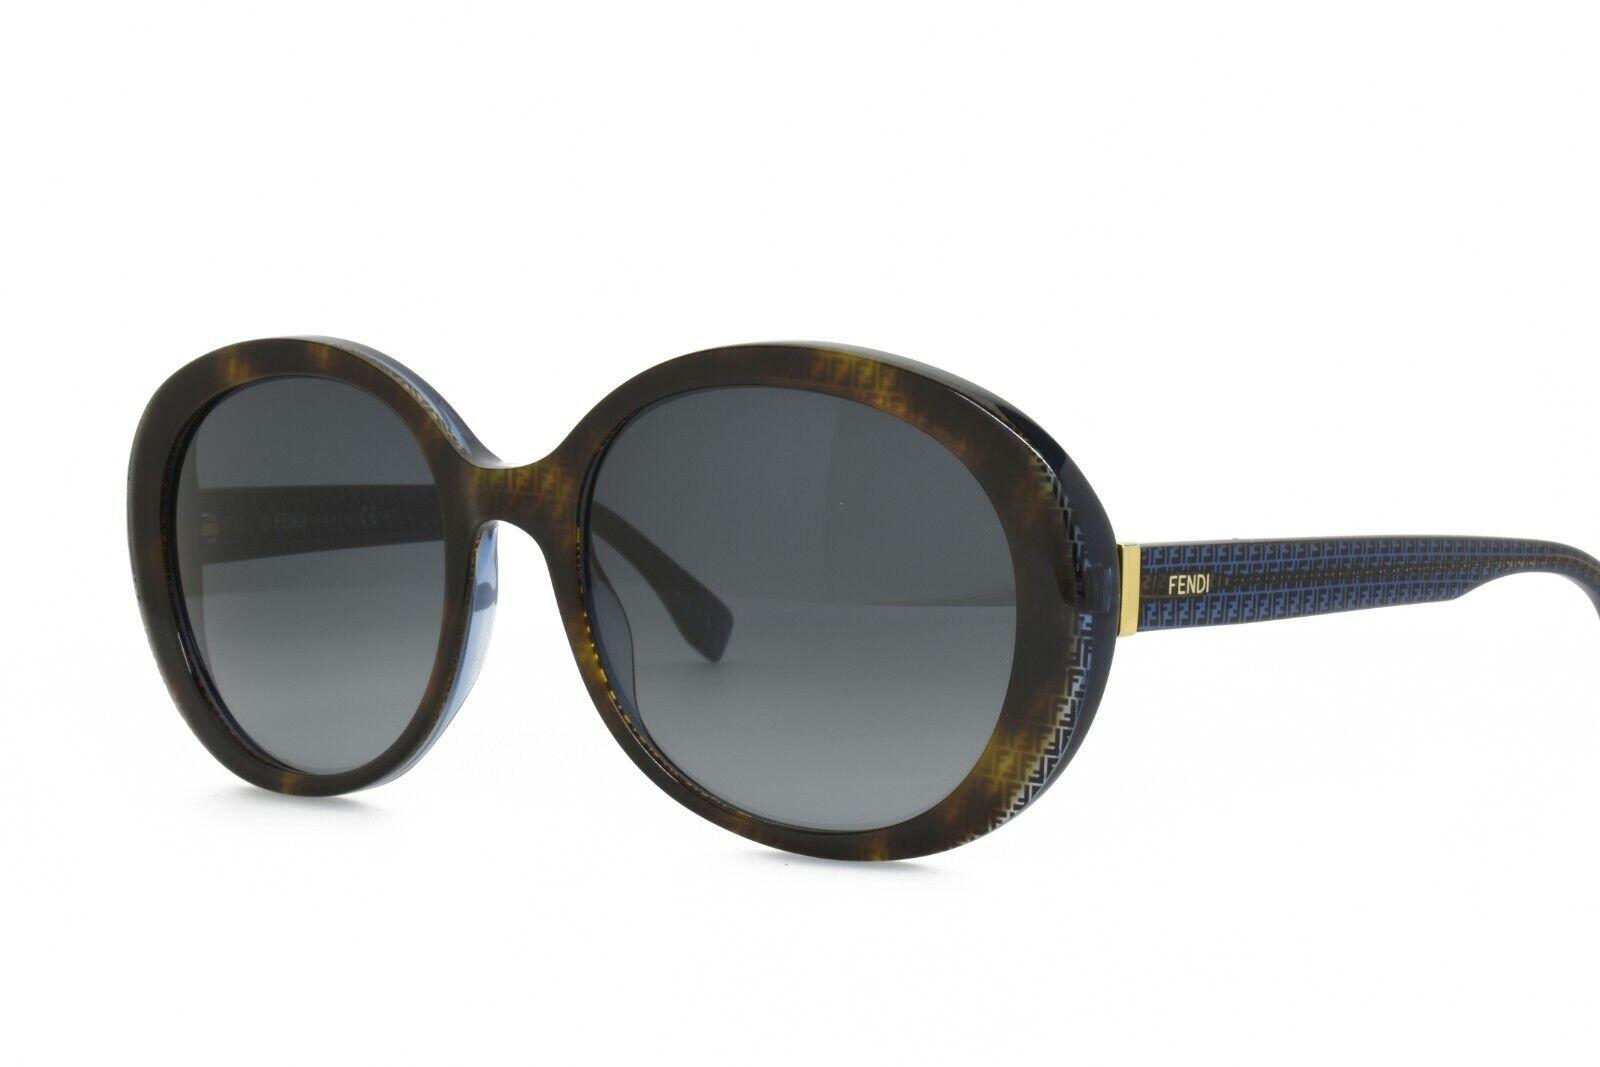 Fendi 0001/S 7OYHD New Authentic Sunglasses 55-19-140 Brown Blue